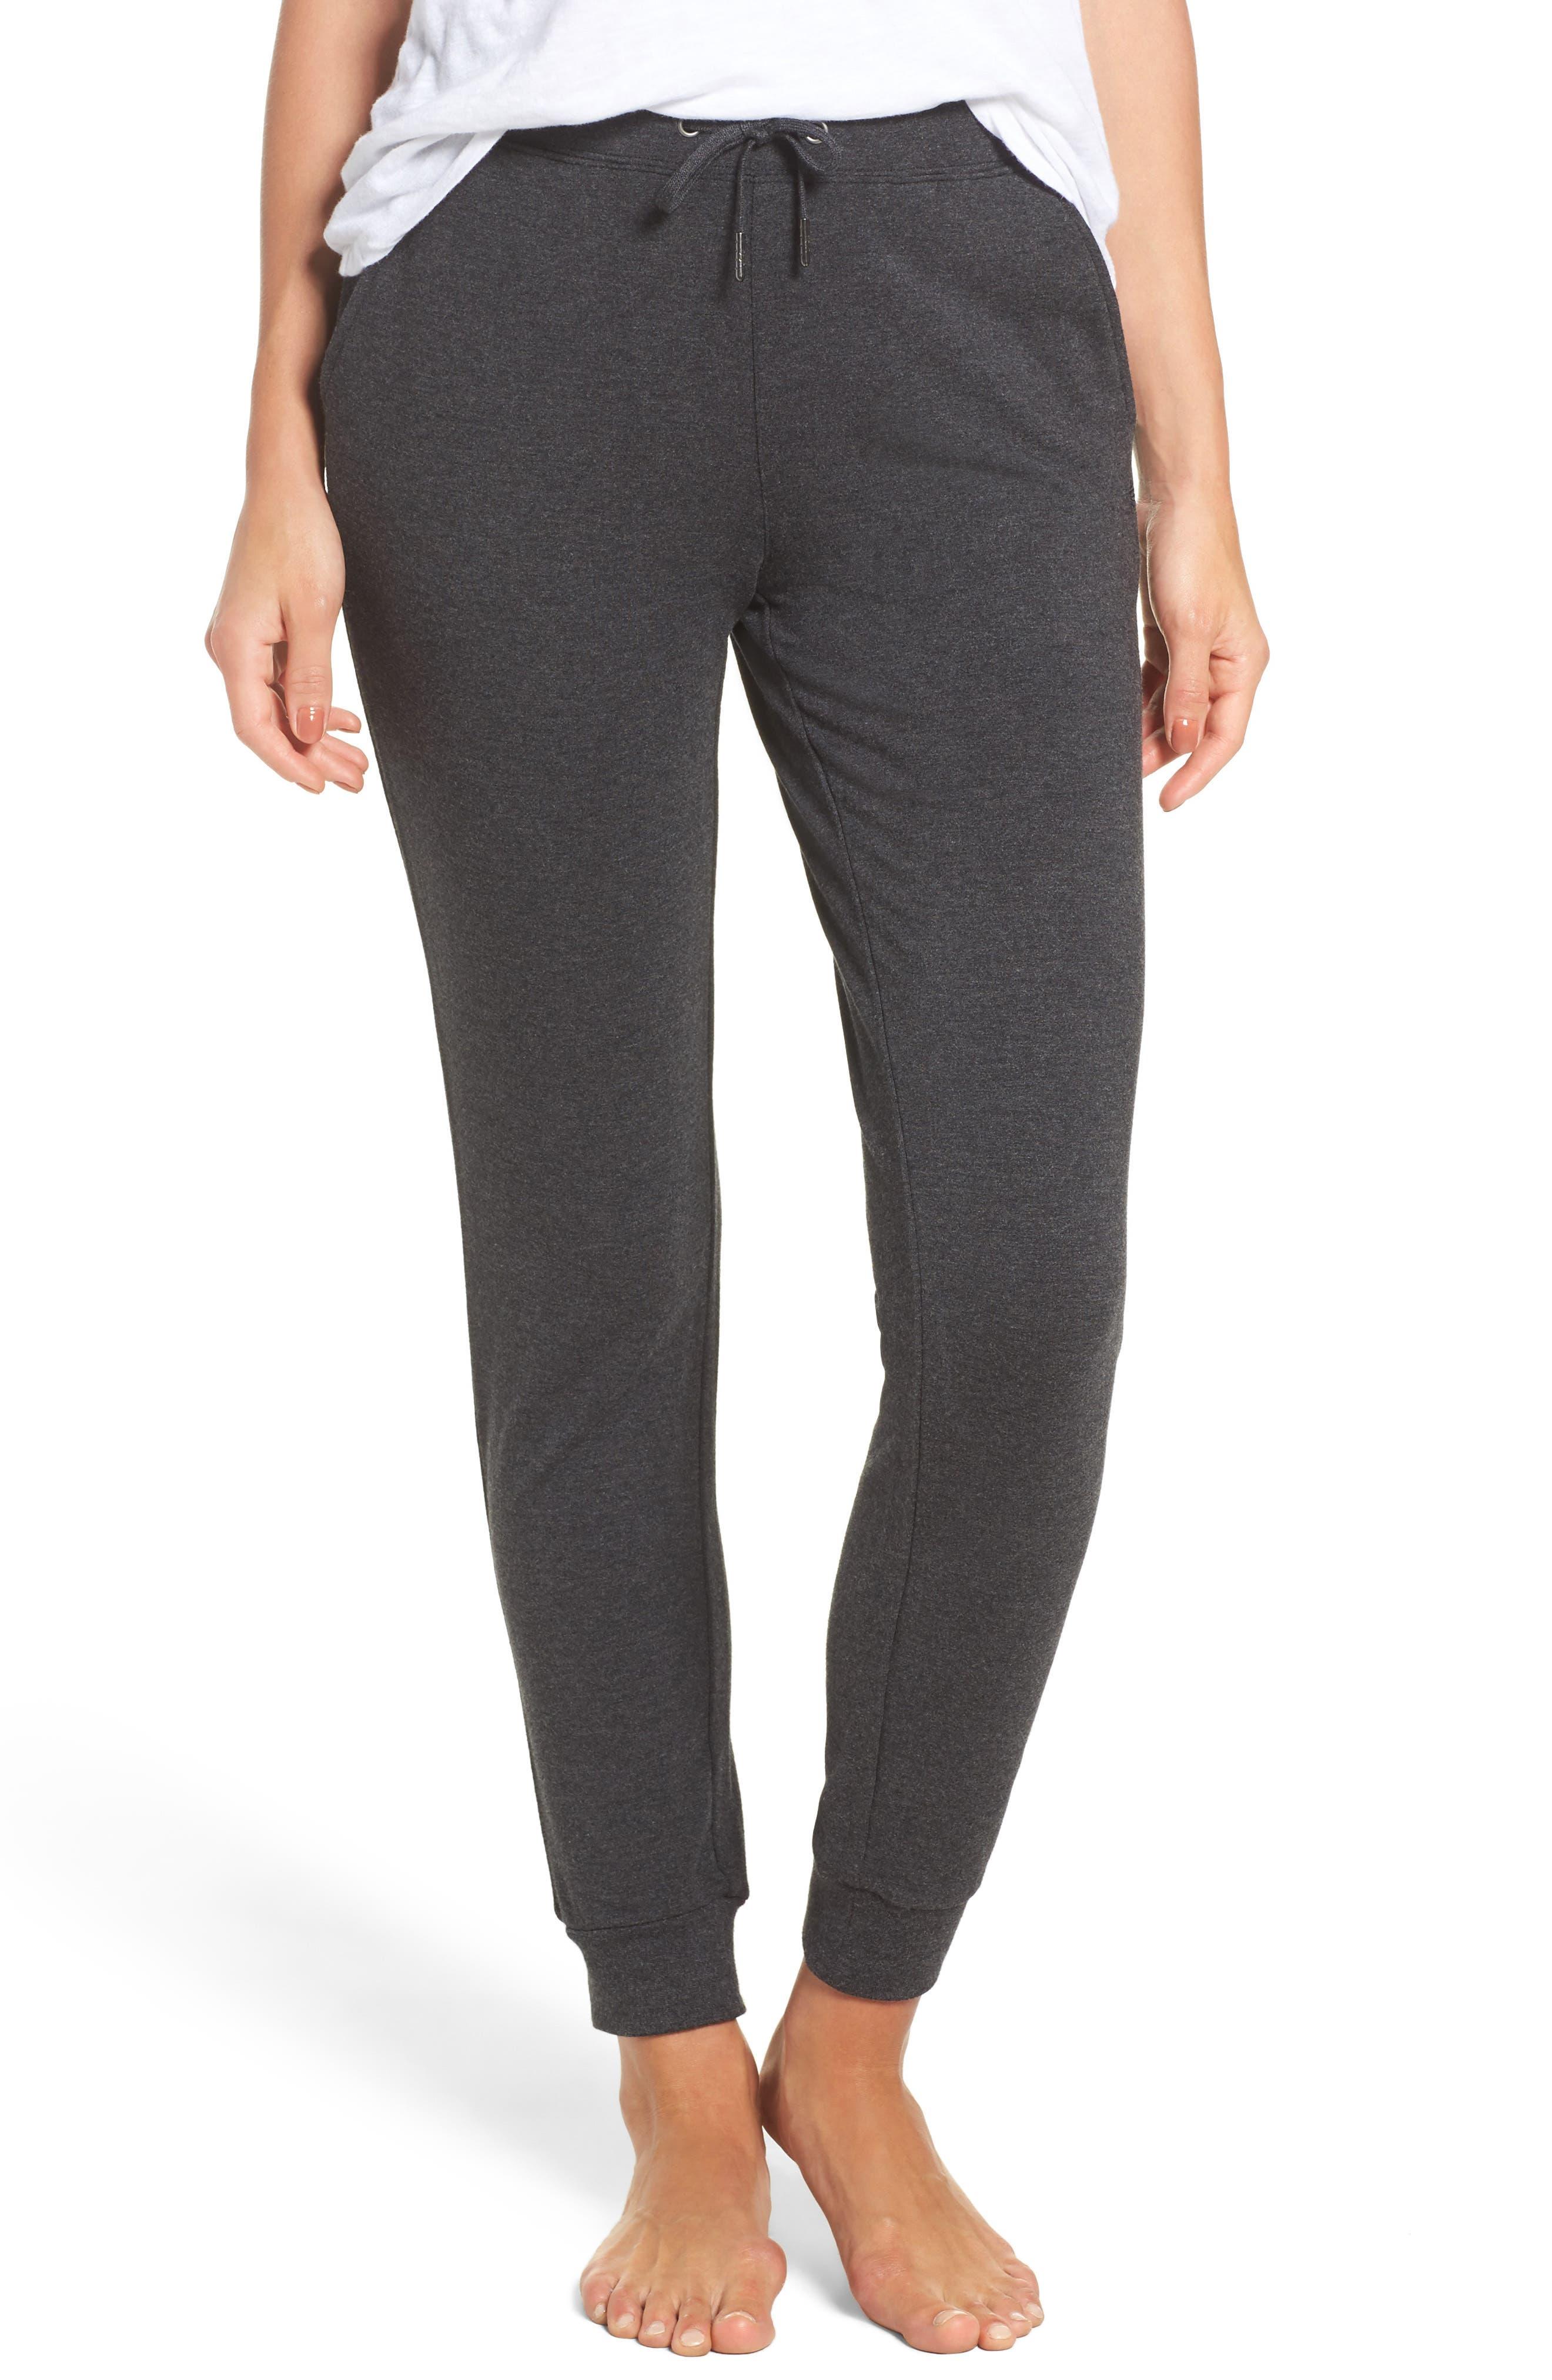 Cozy Fleece Jogger Pants,                         Main,                         color, 001